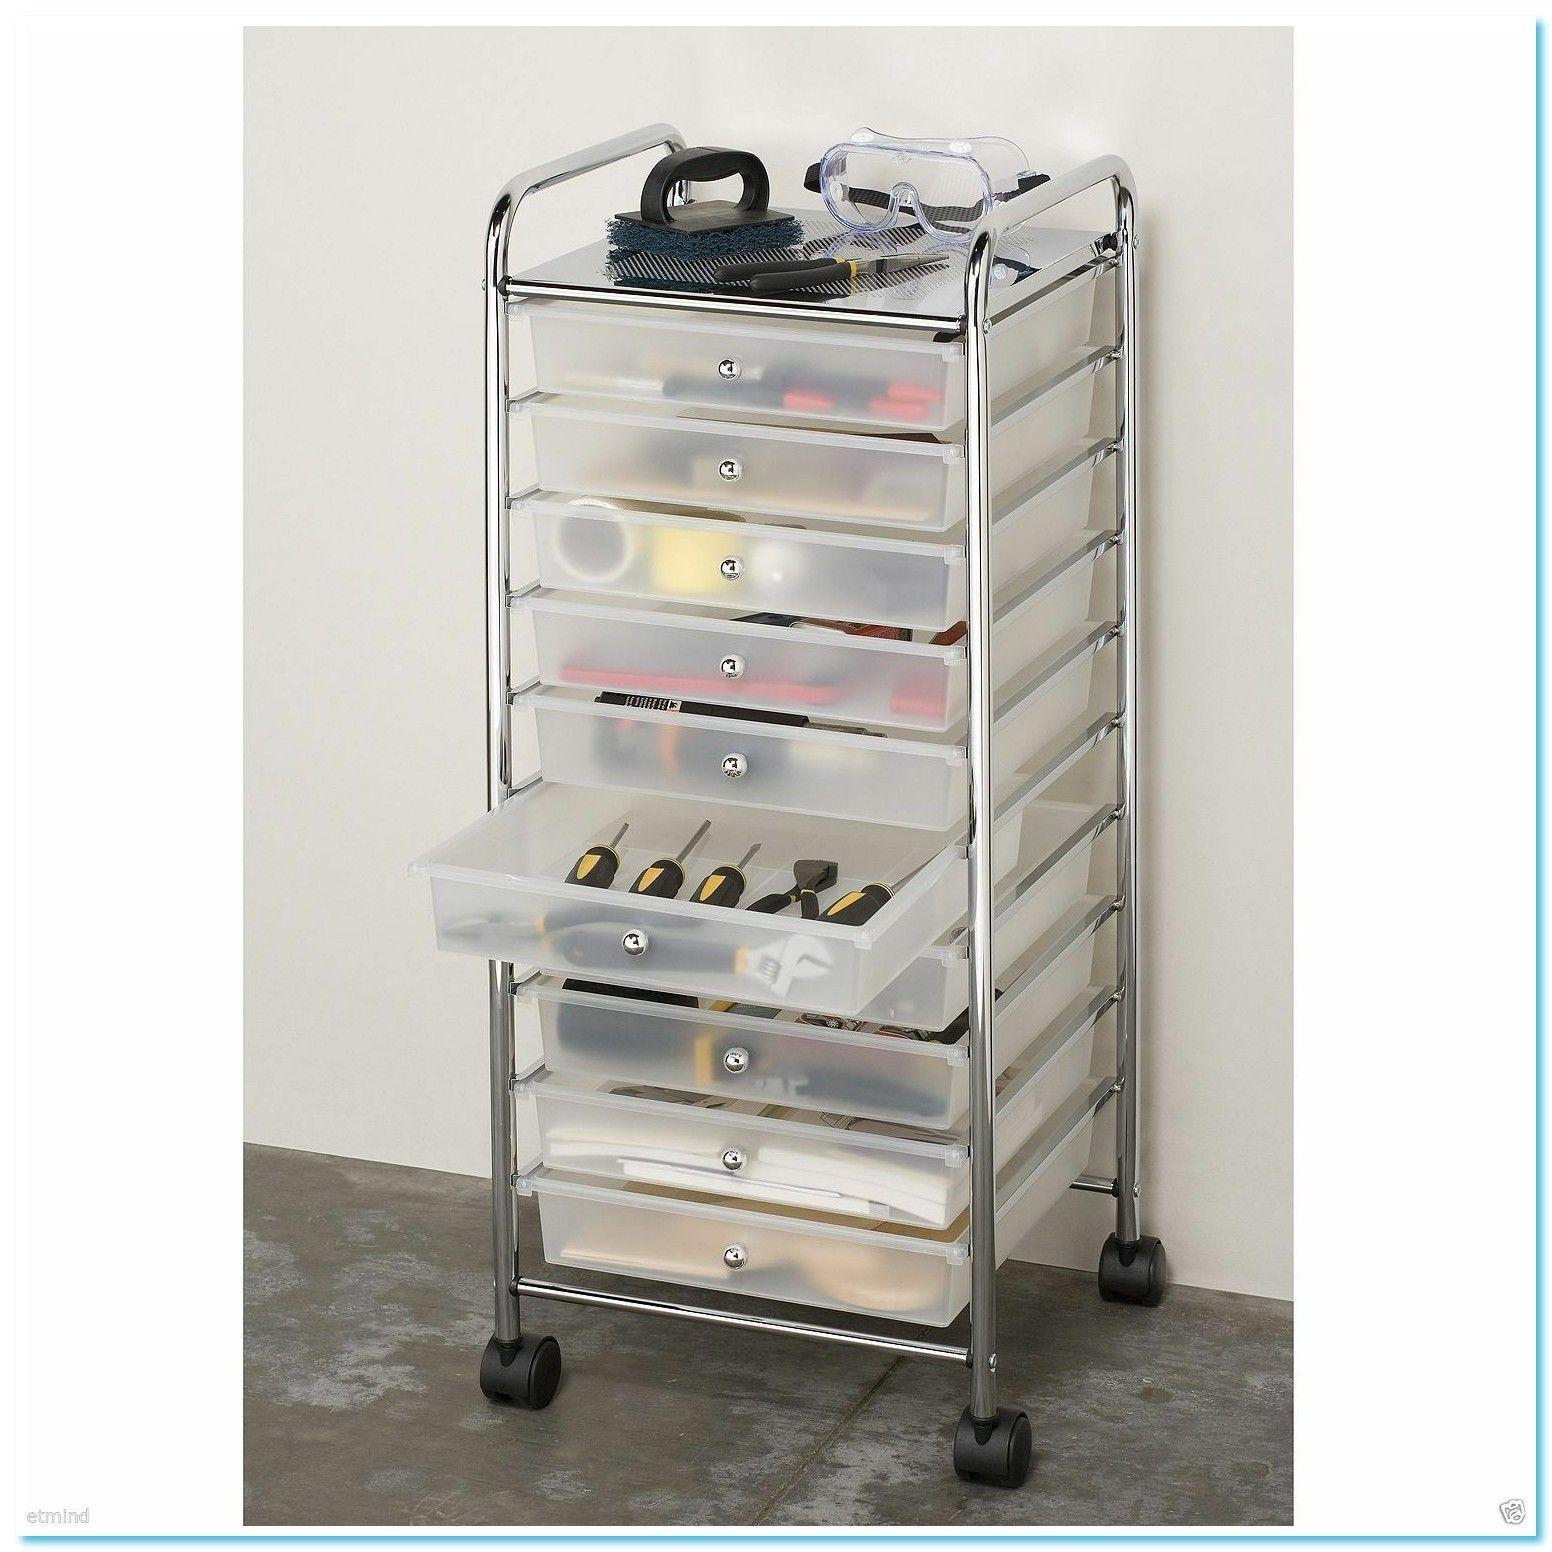 50 Reference Of 10 Drawer Craft Cart In 2020 Organization Cart Drawer Organisers Drawers